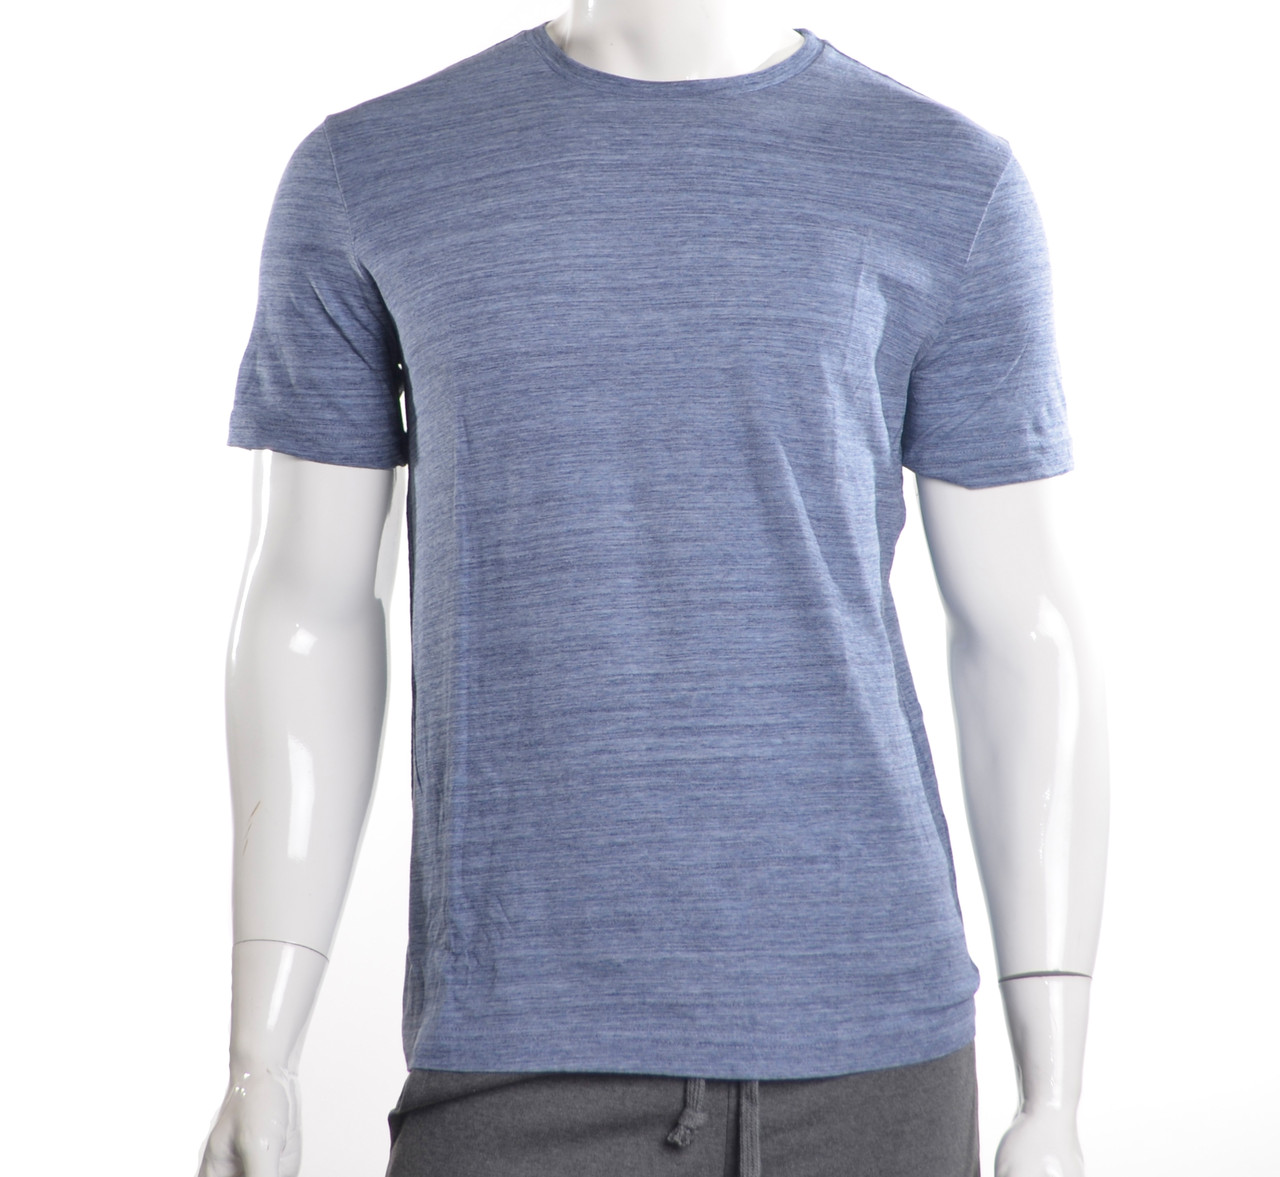 Мужская футболка синий меланж